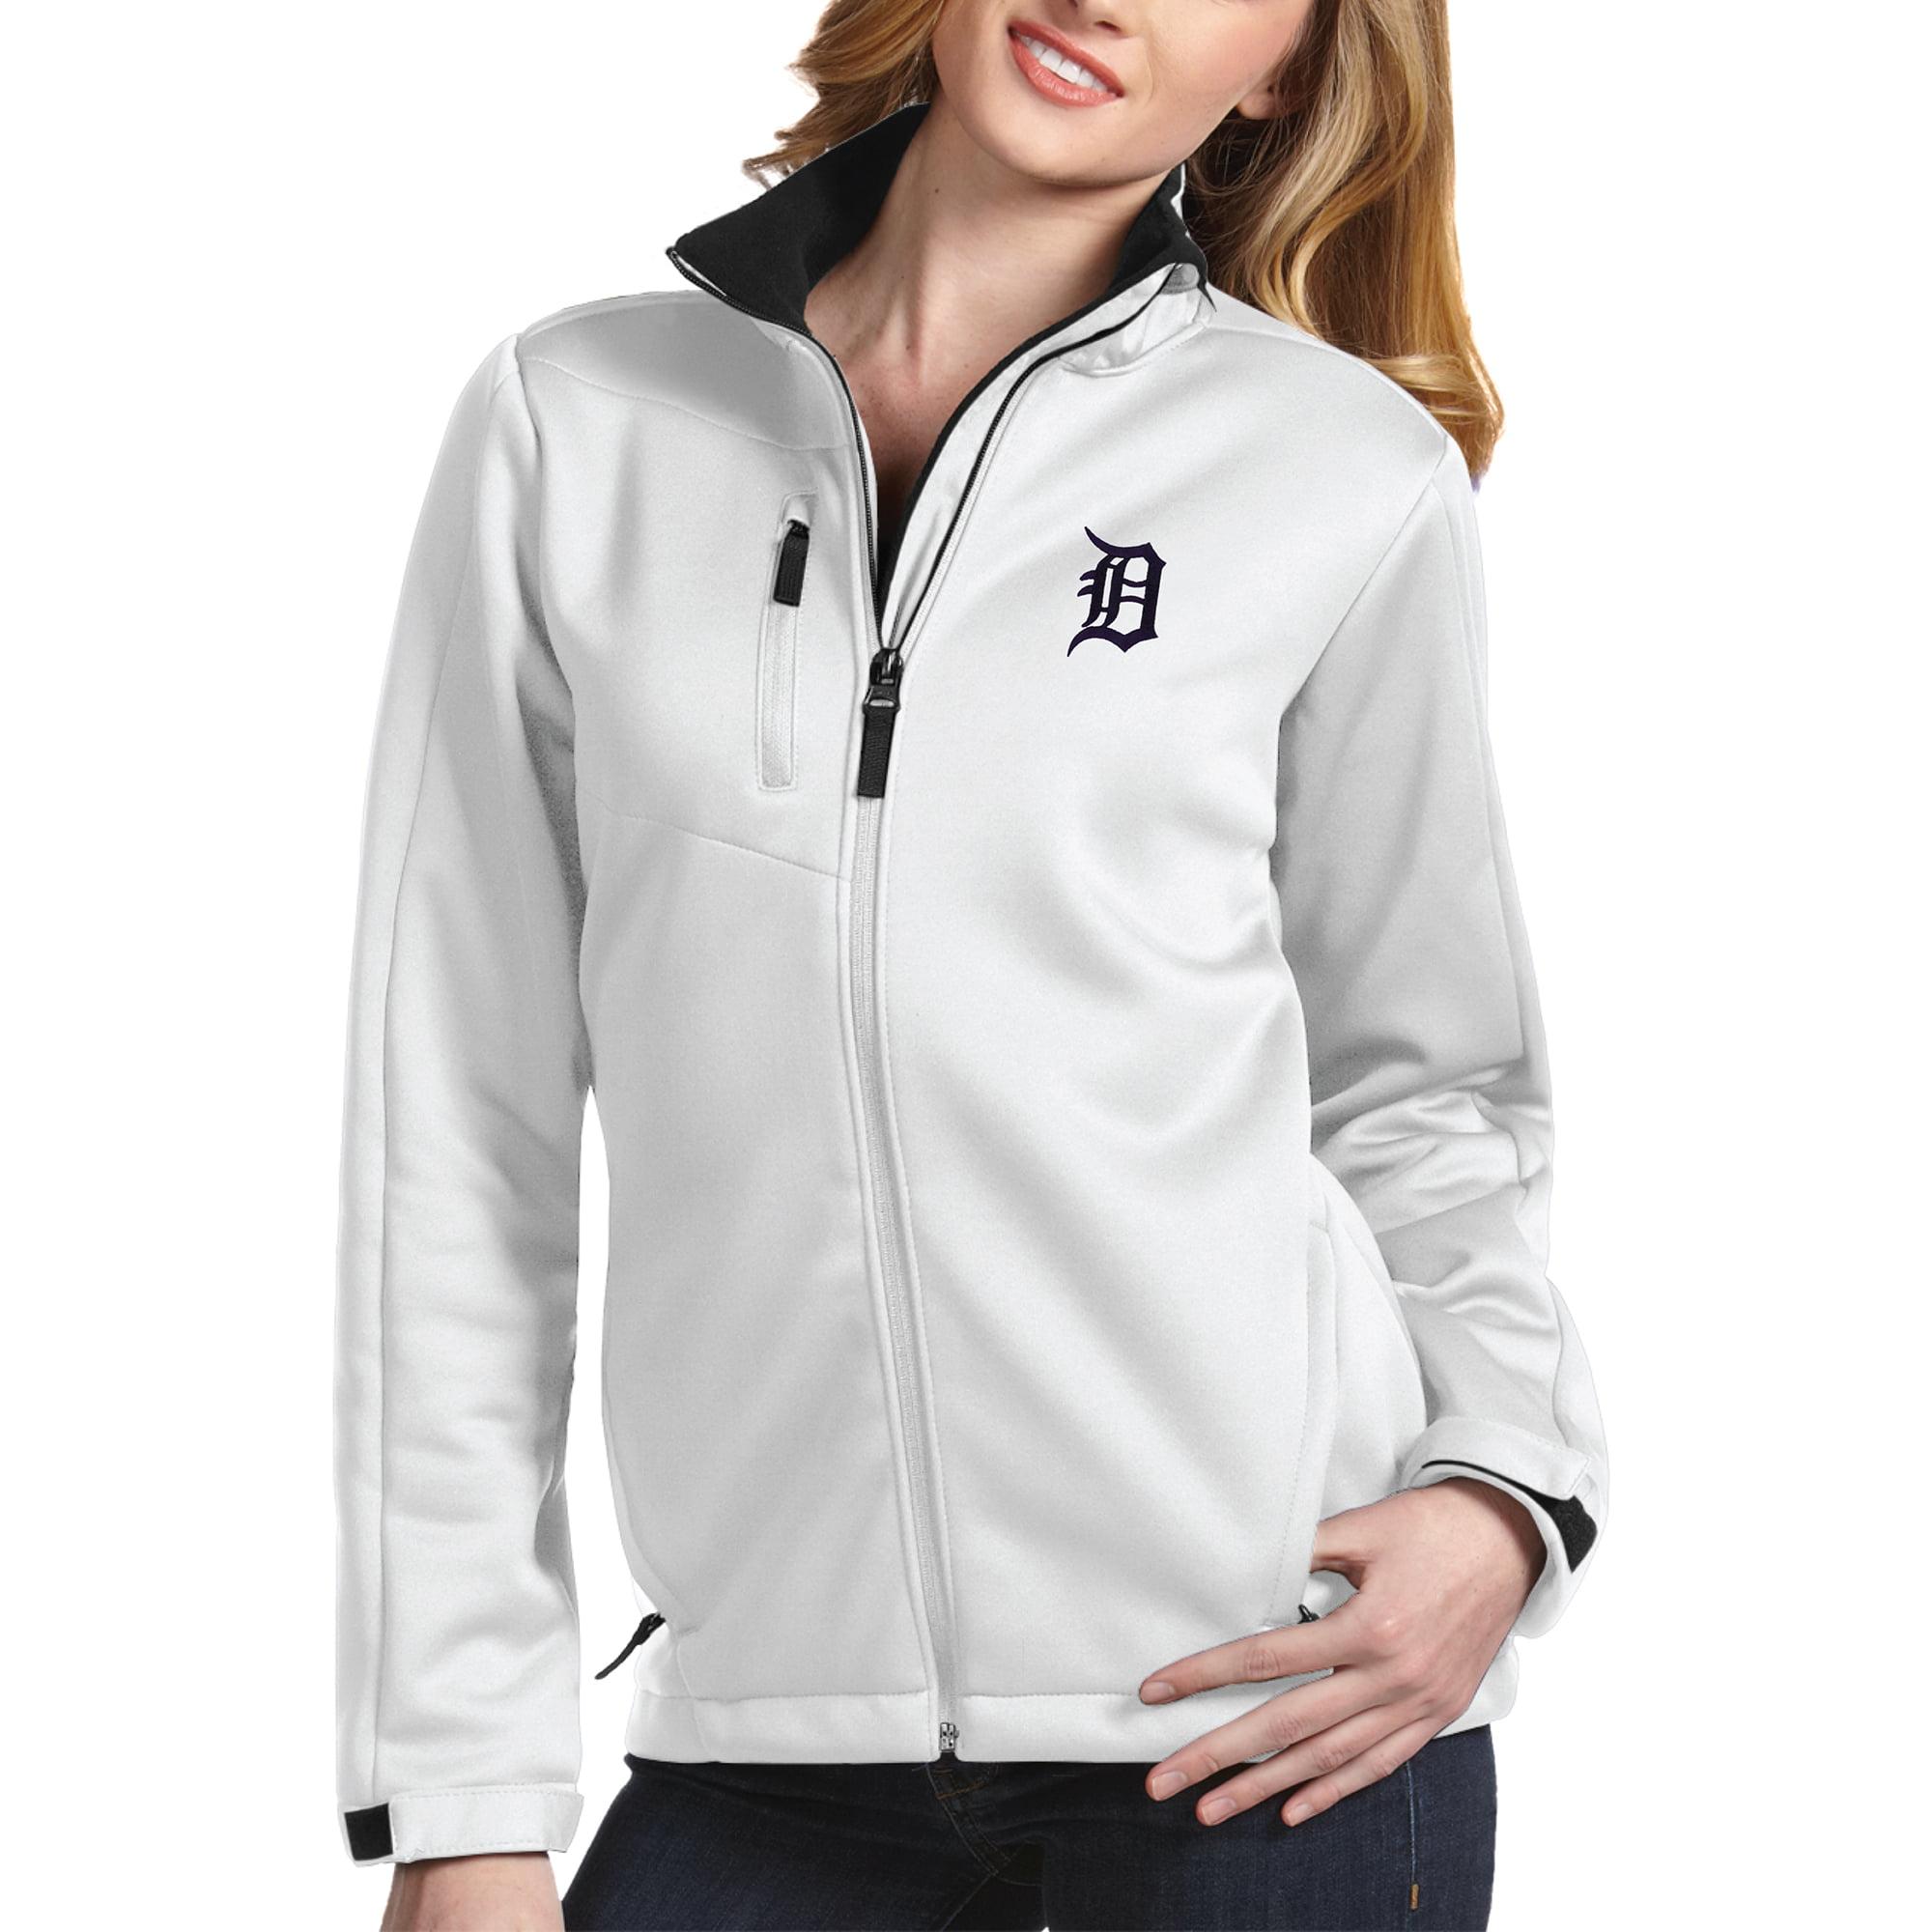 Detroit Tigers Antigua Women's Traverse Jacket - White